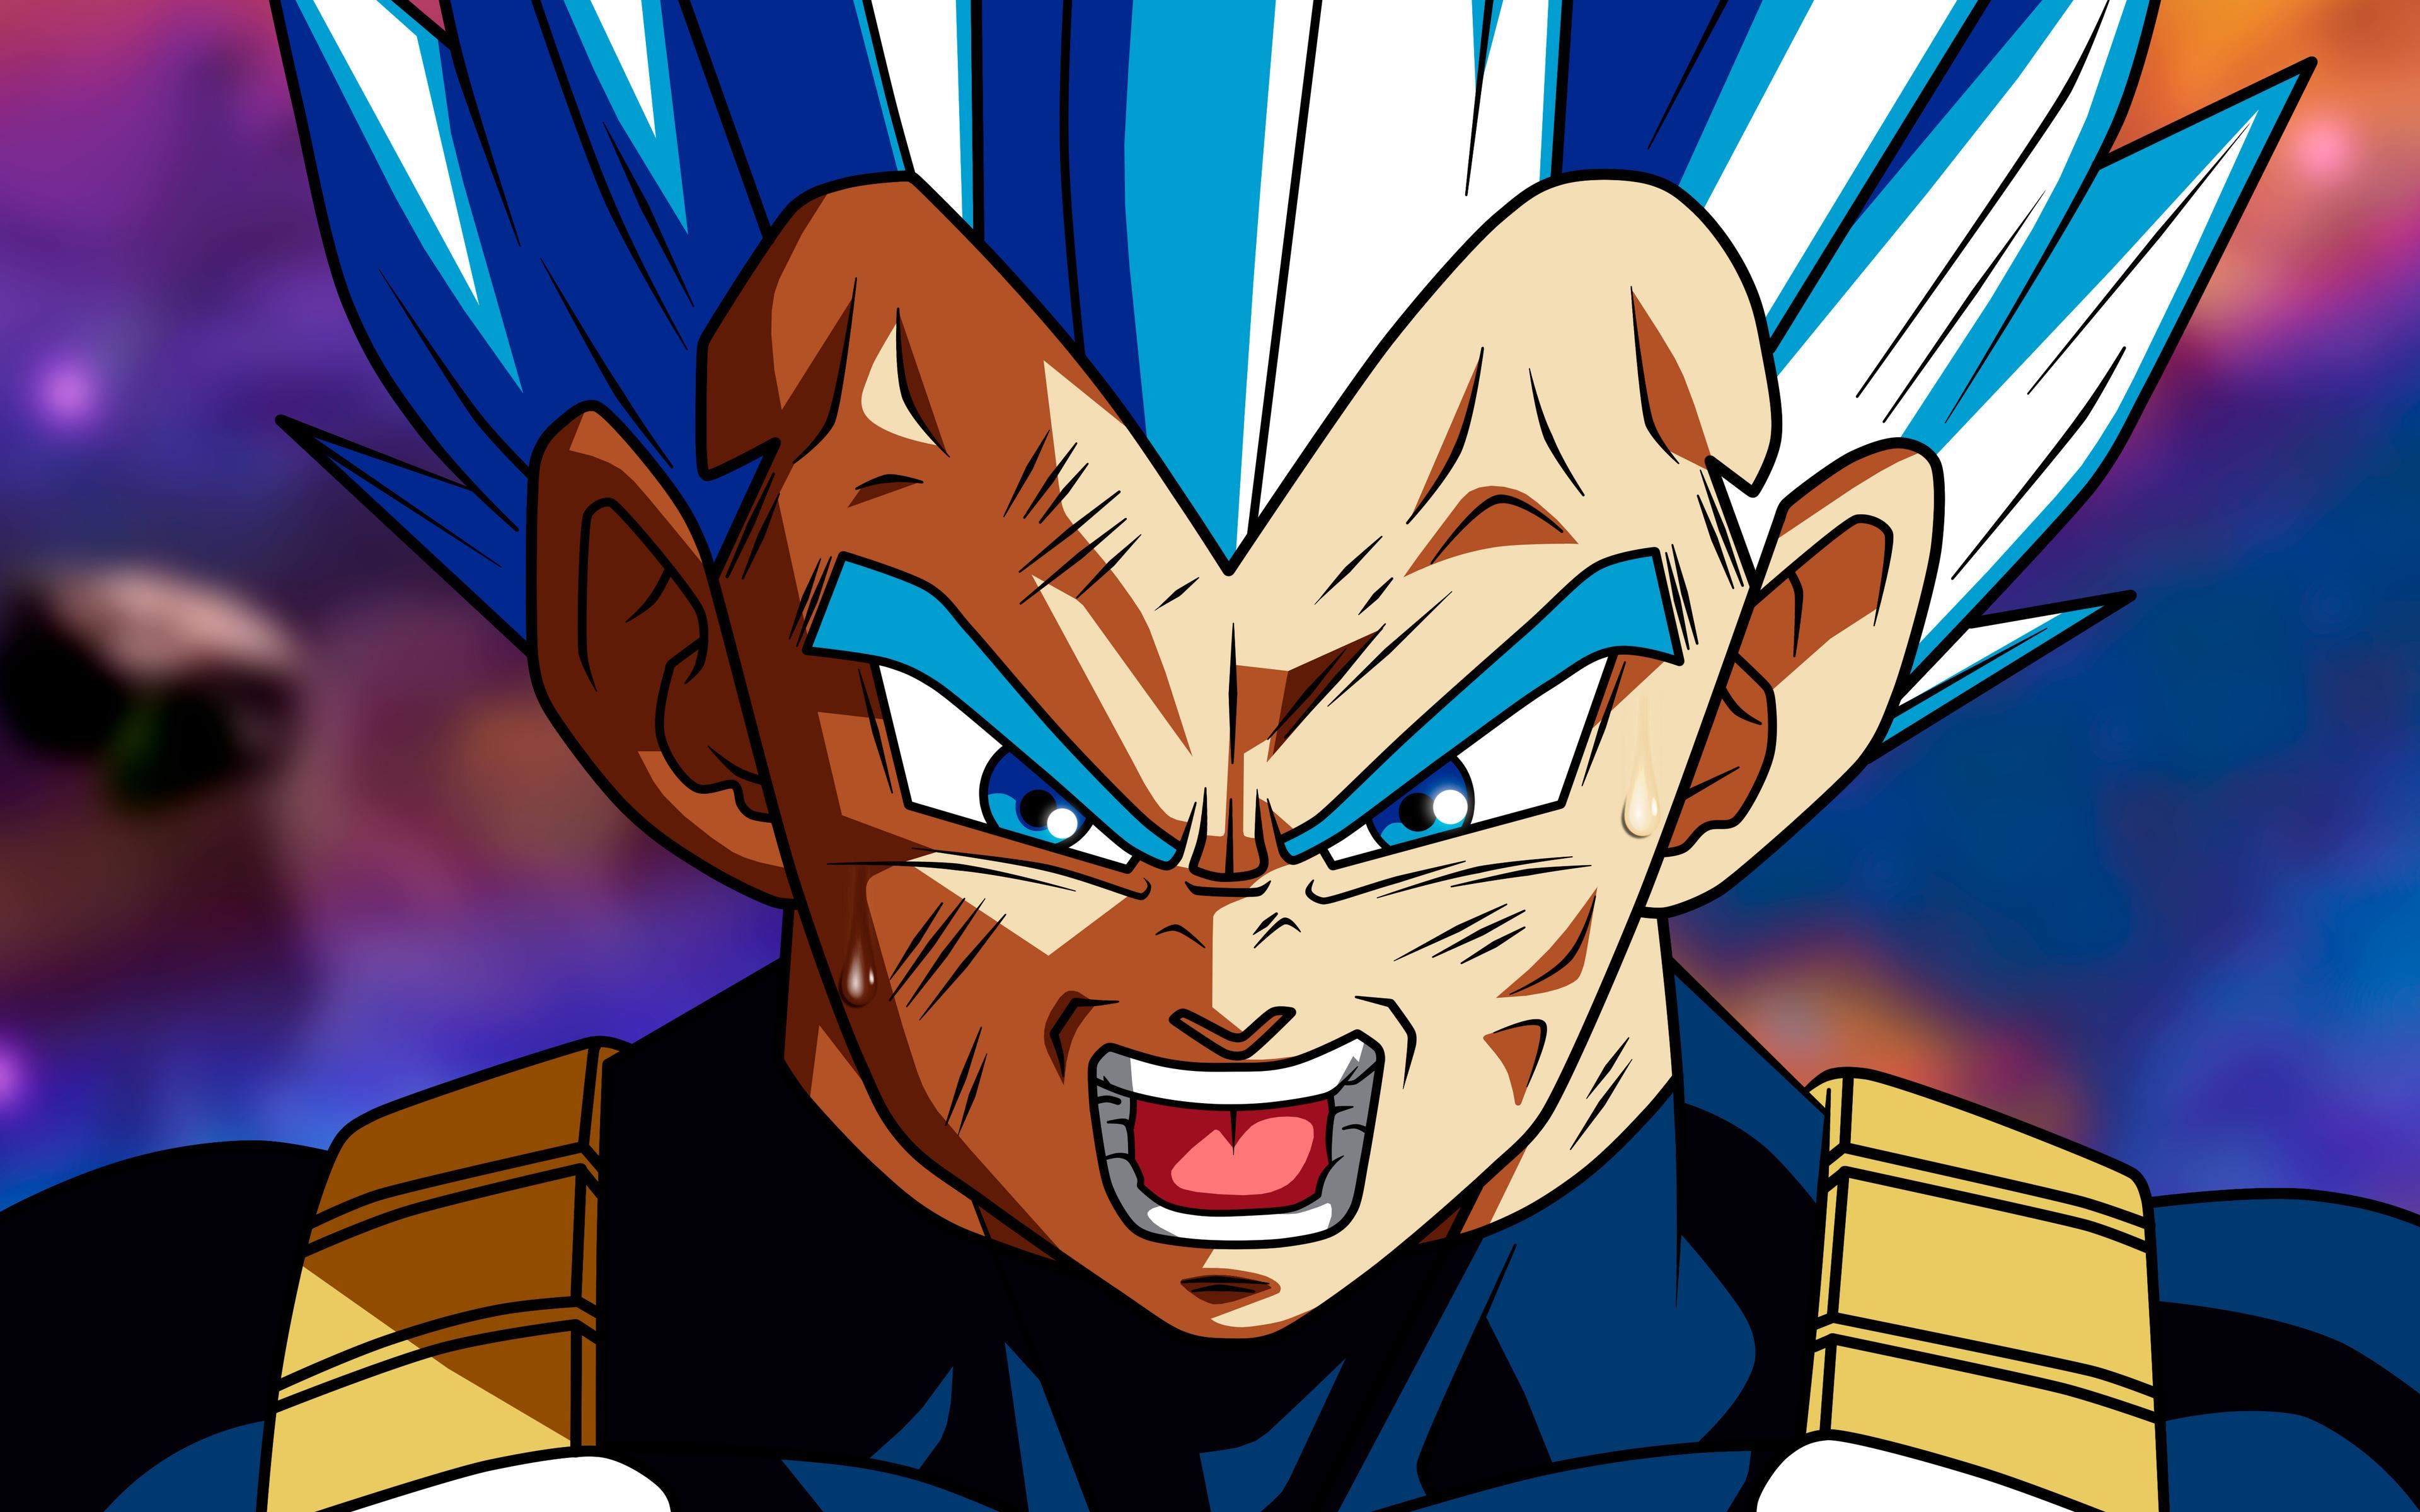 3840x2400 5k Anime Dragon Ball Super 4k HD 4k Wallpapers